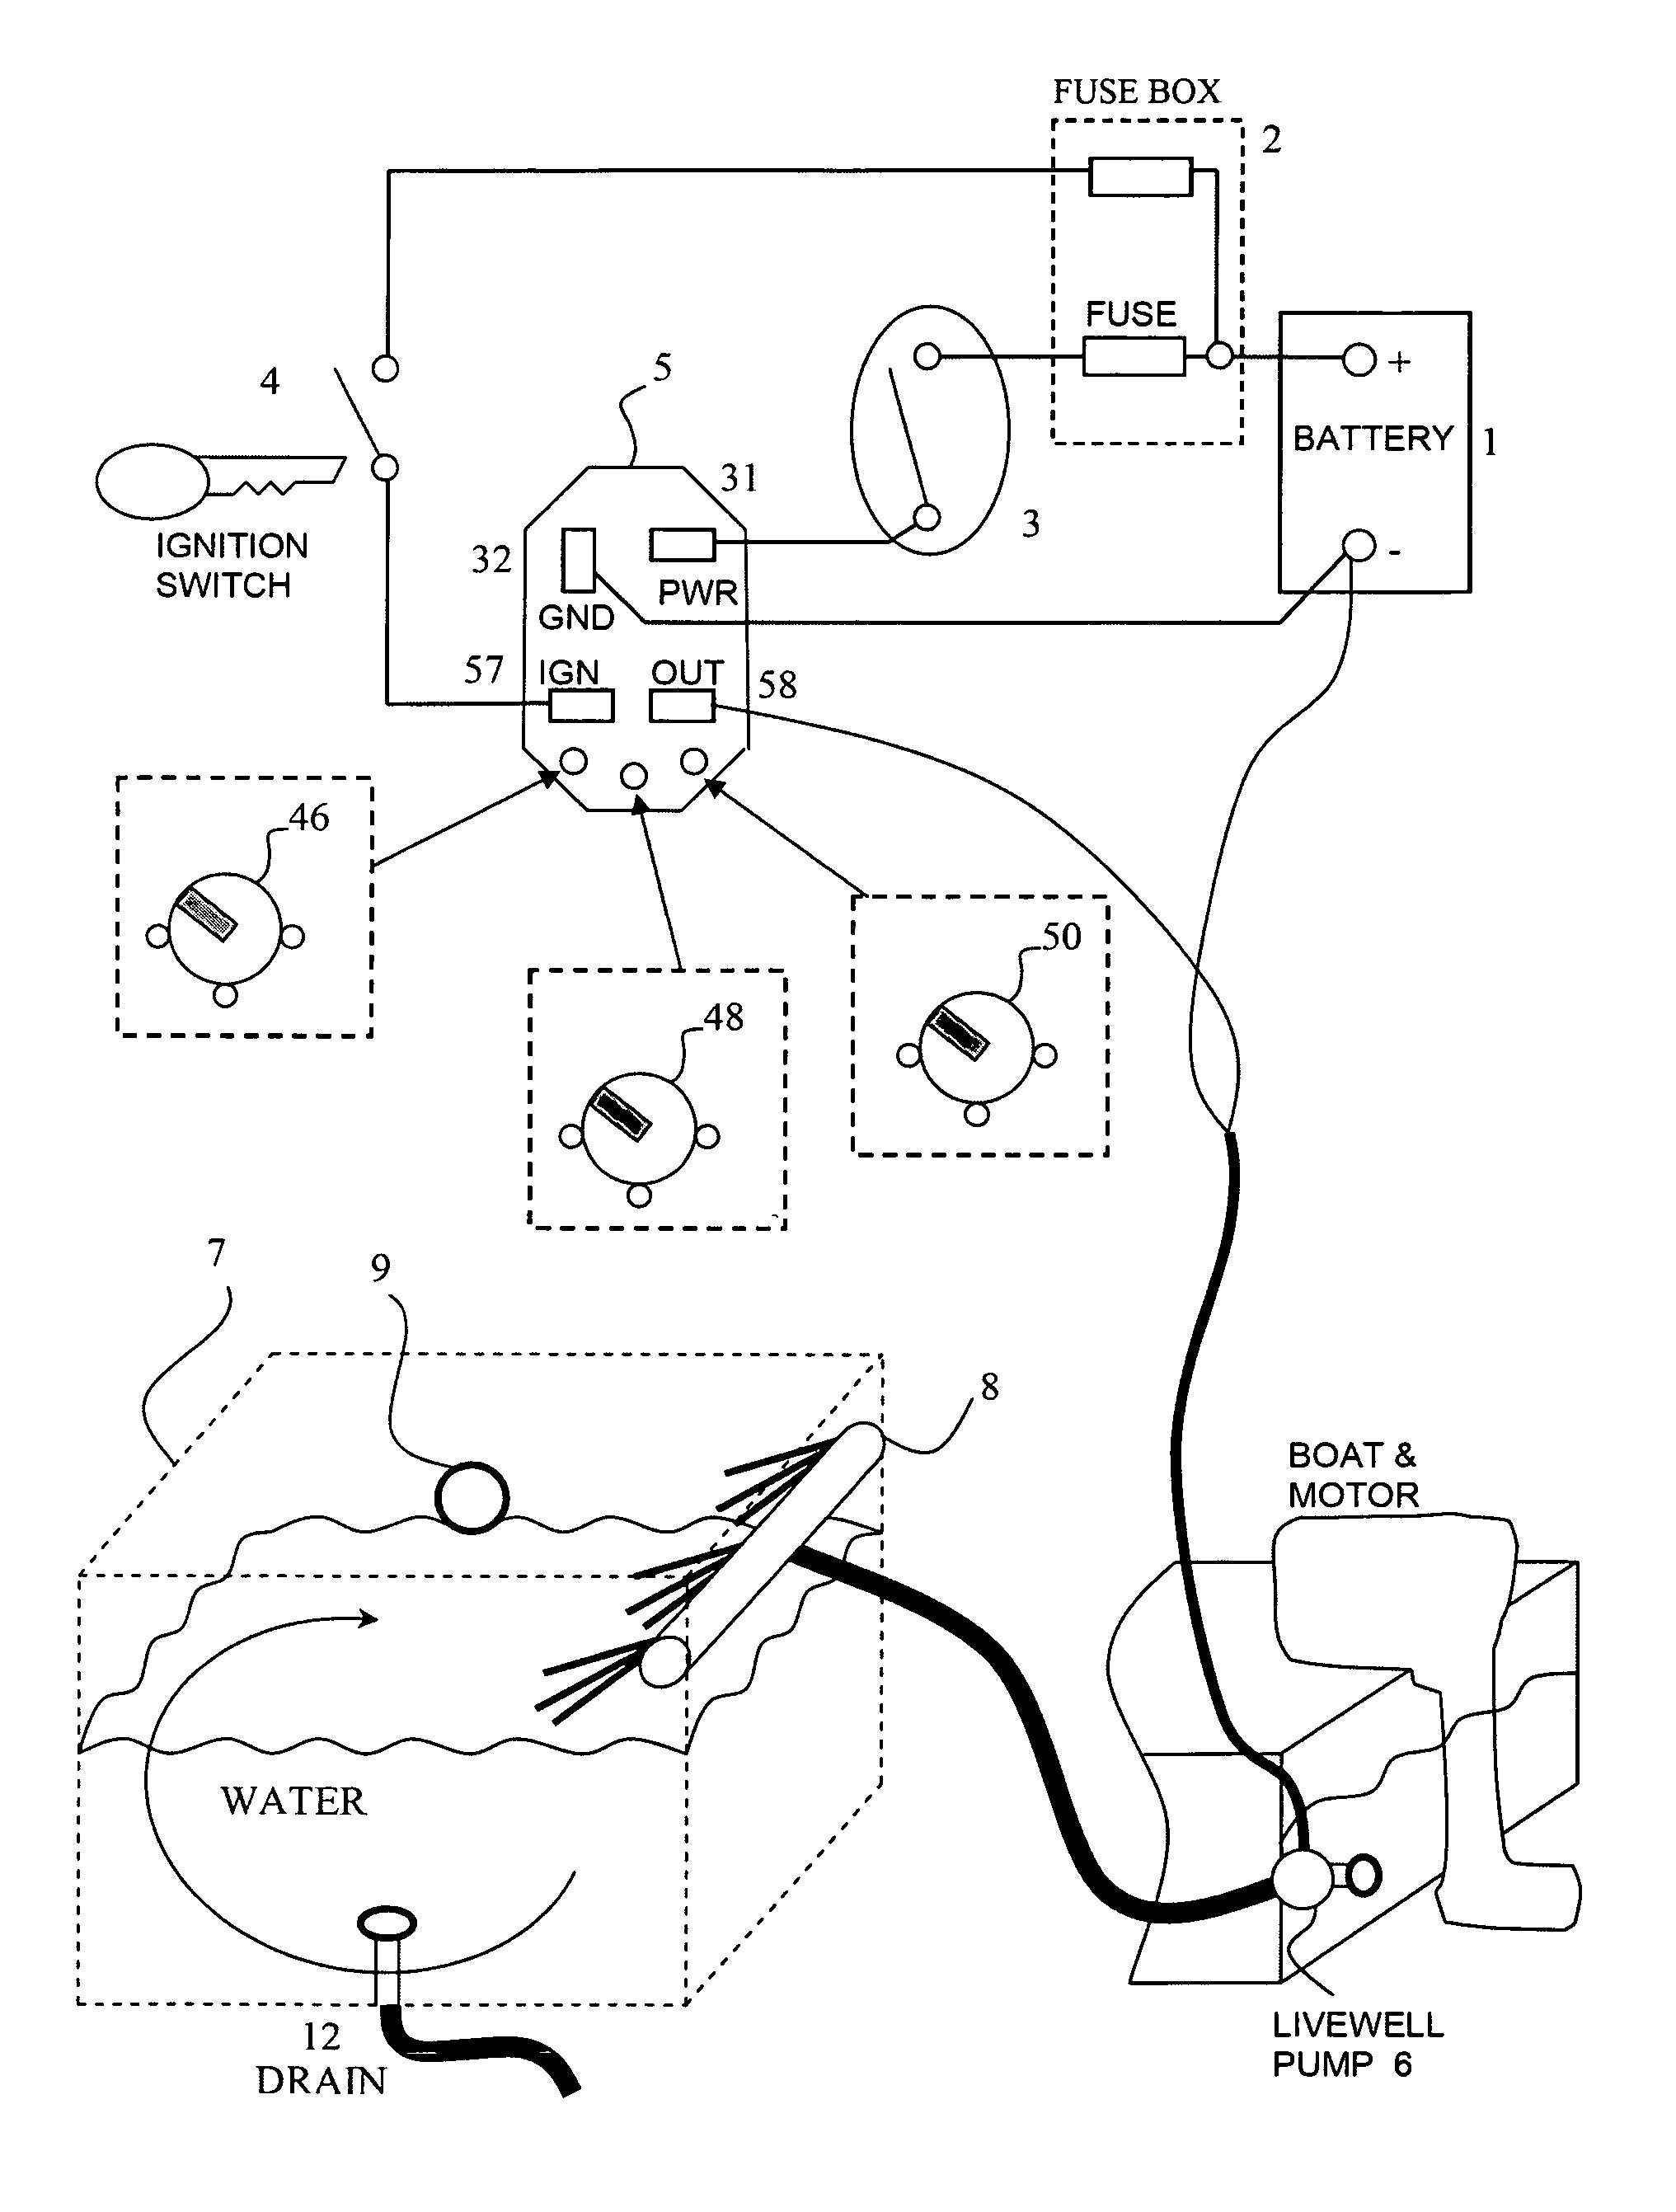 Mercedes Engine Diagram together with Mercedes Sl Door Trim in addition 125746 Mercedes 280c Engine Diagrams as well Mercedes Gl450 Diagram Of Engine further Livewell Wiring Diagram. on c36 wiring diagram